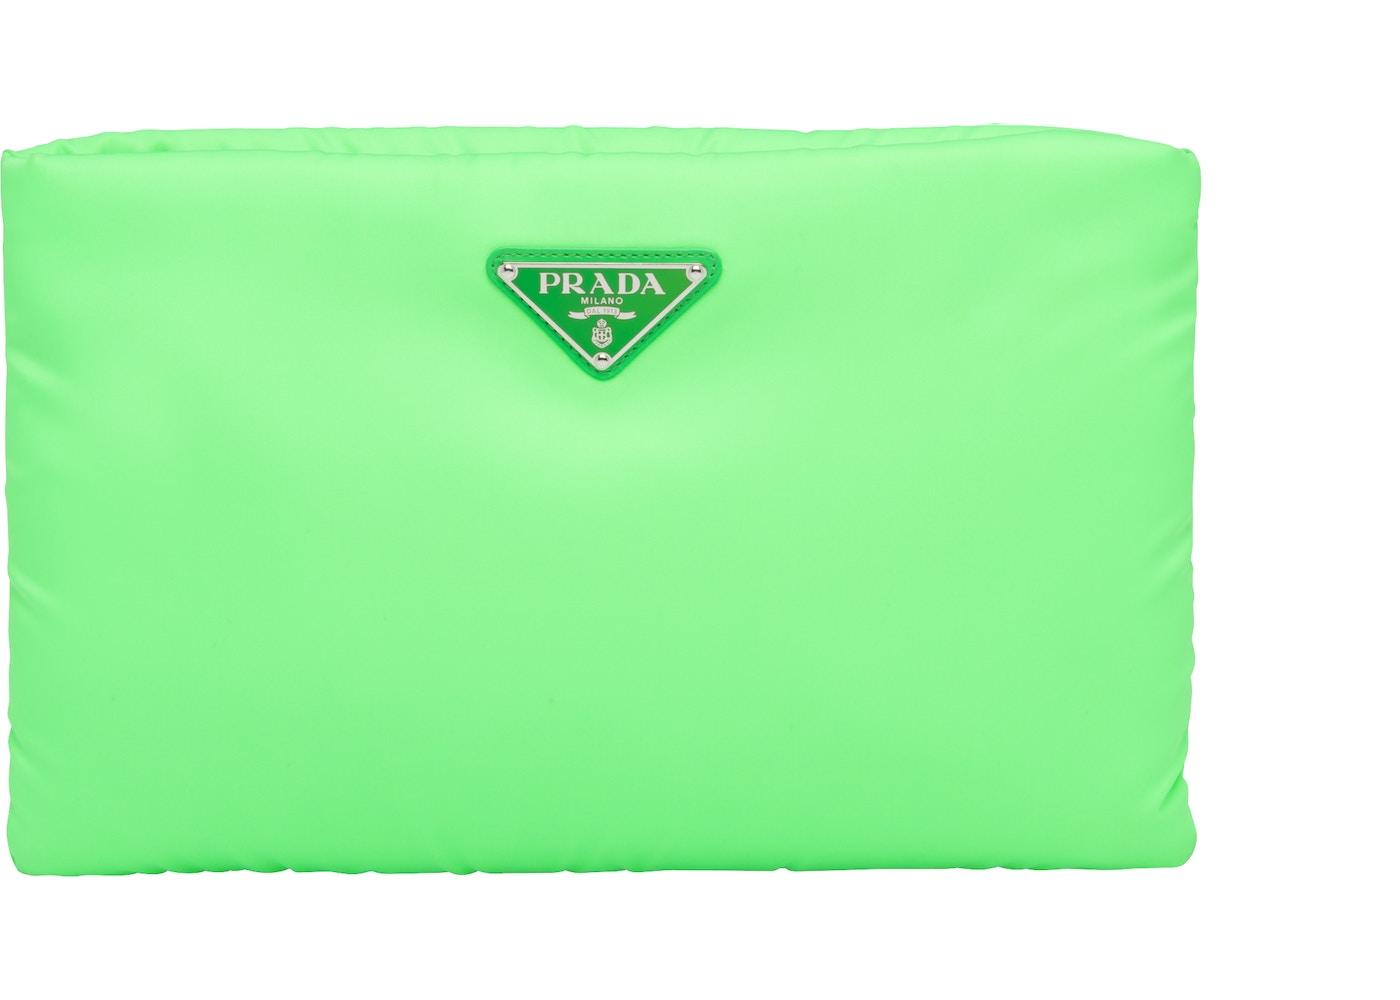 0d146050dd213f Prada Clutch Padded Nylon Medium Green. Medium Green